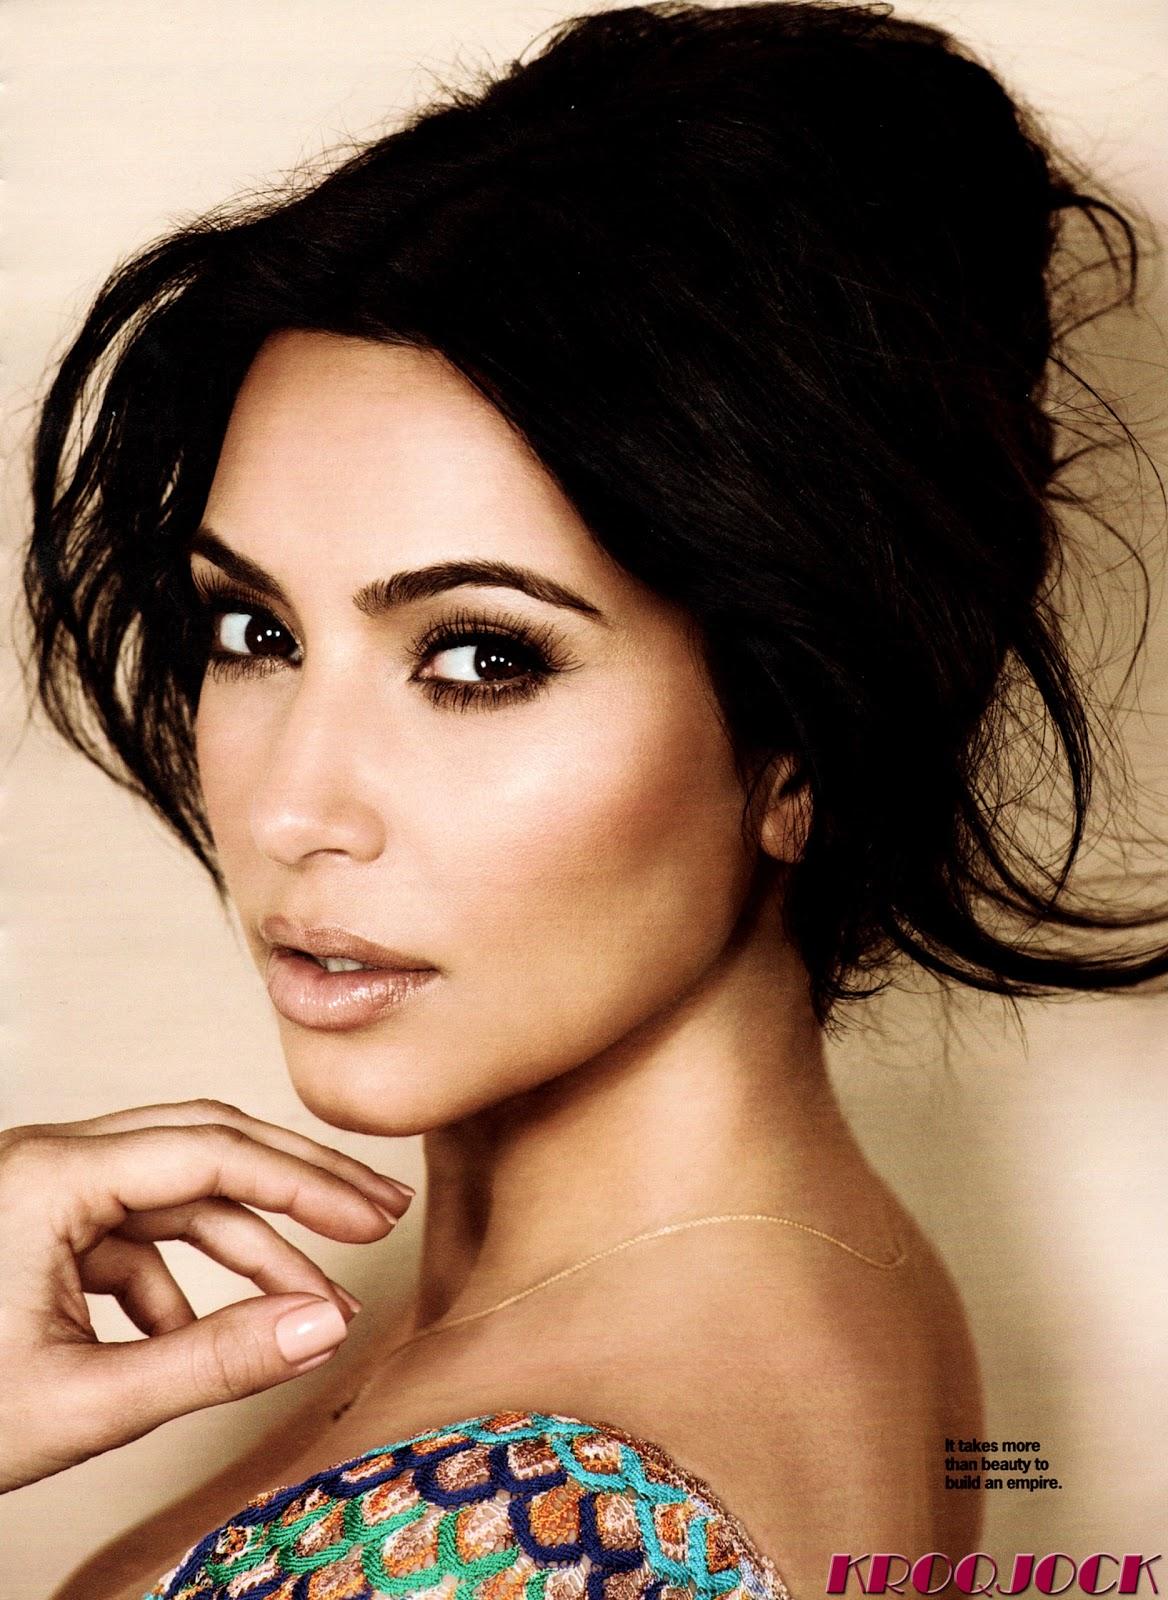 http://3.bp.blogspot.com/-0JhvslssWwg/ThyPooNUhII/AAAAAAAAAOk/xeCYLdd9rRE/s1600/Kim_Kardashian_Hairstyles_2011.jpg